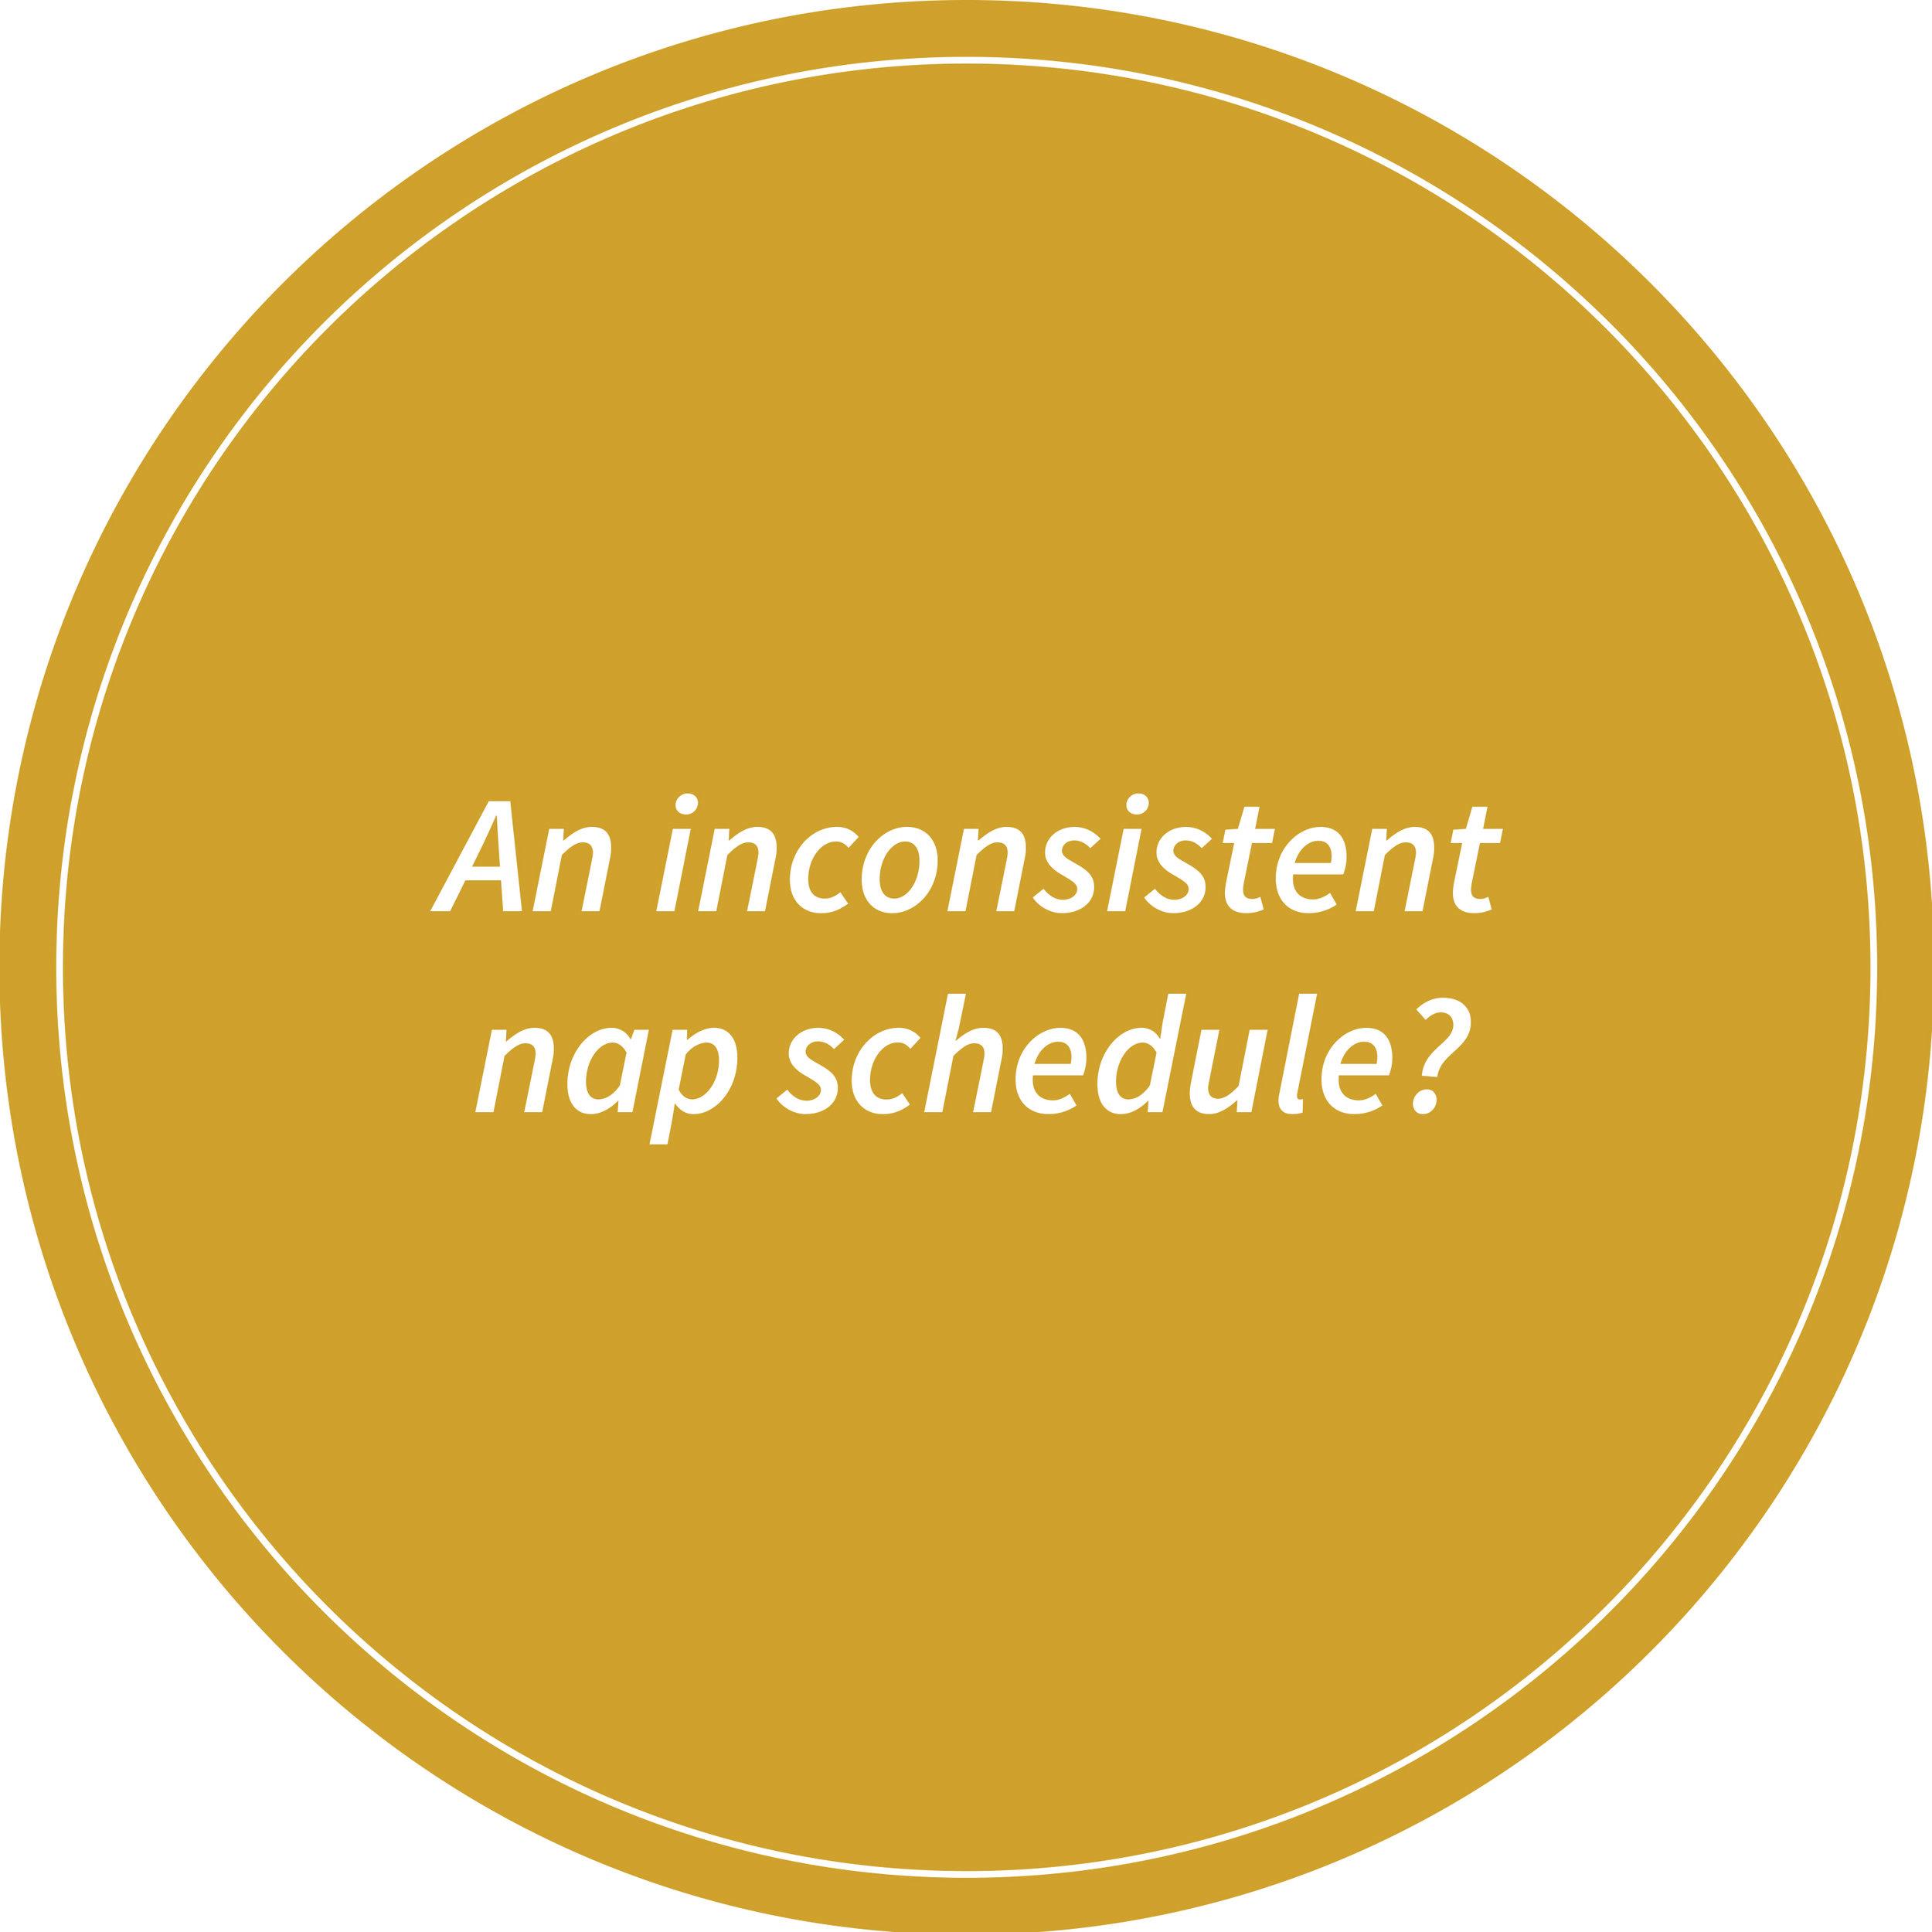 inconsistent-nap-schedule